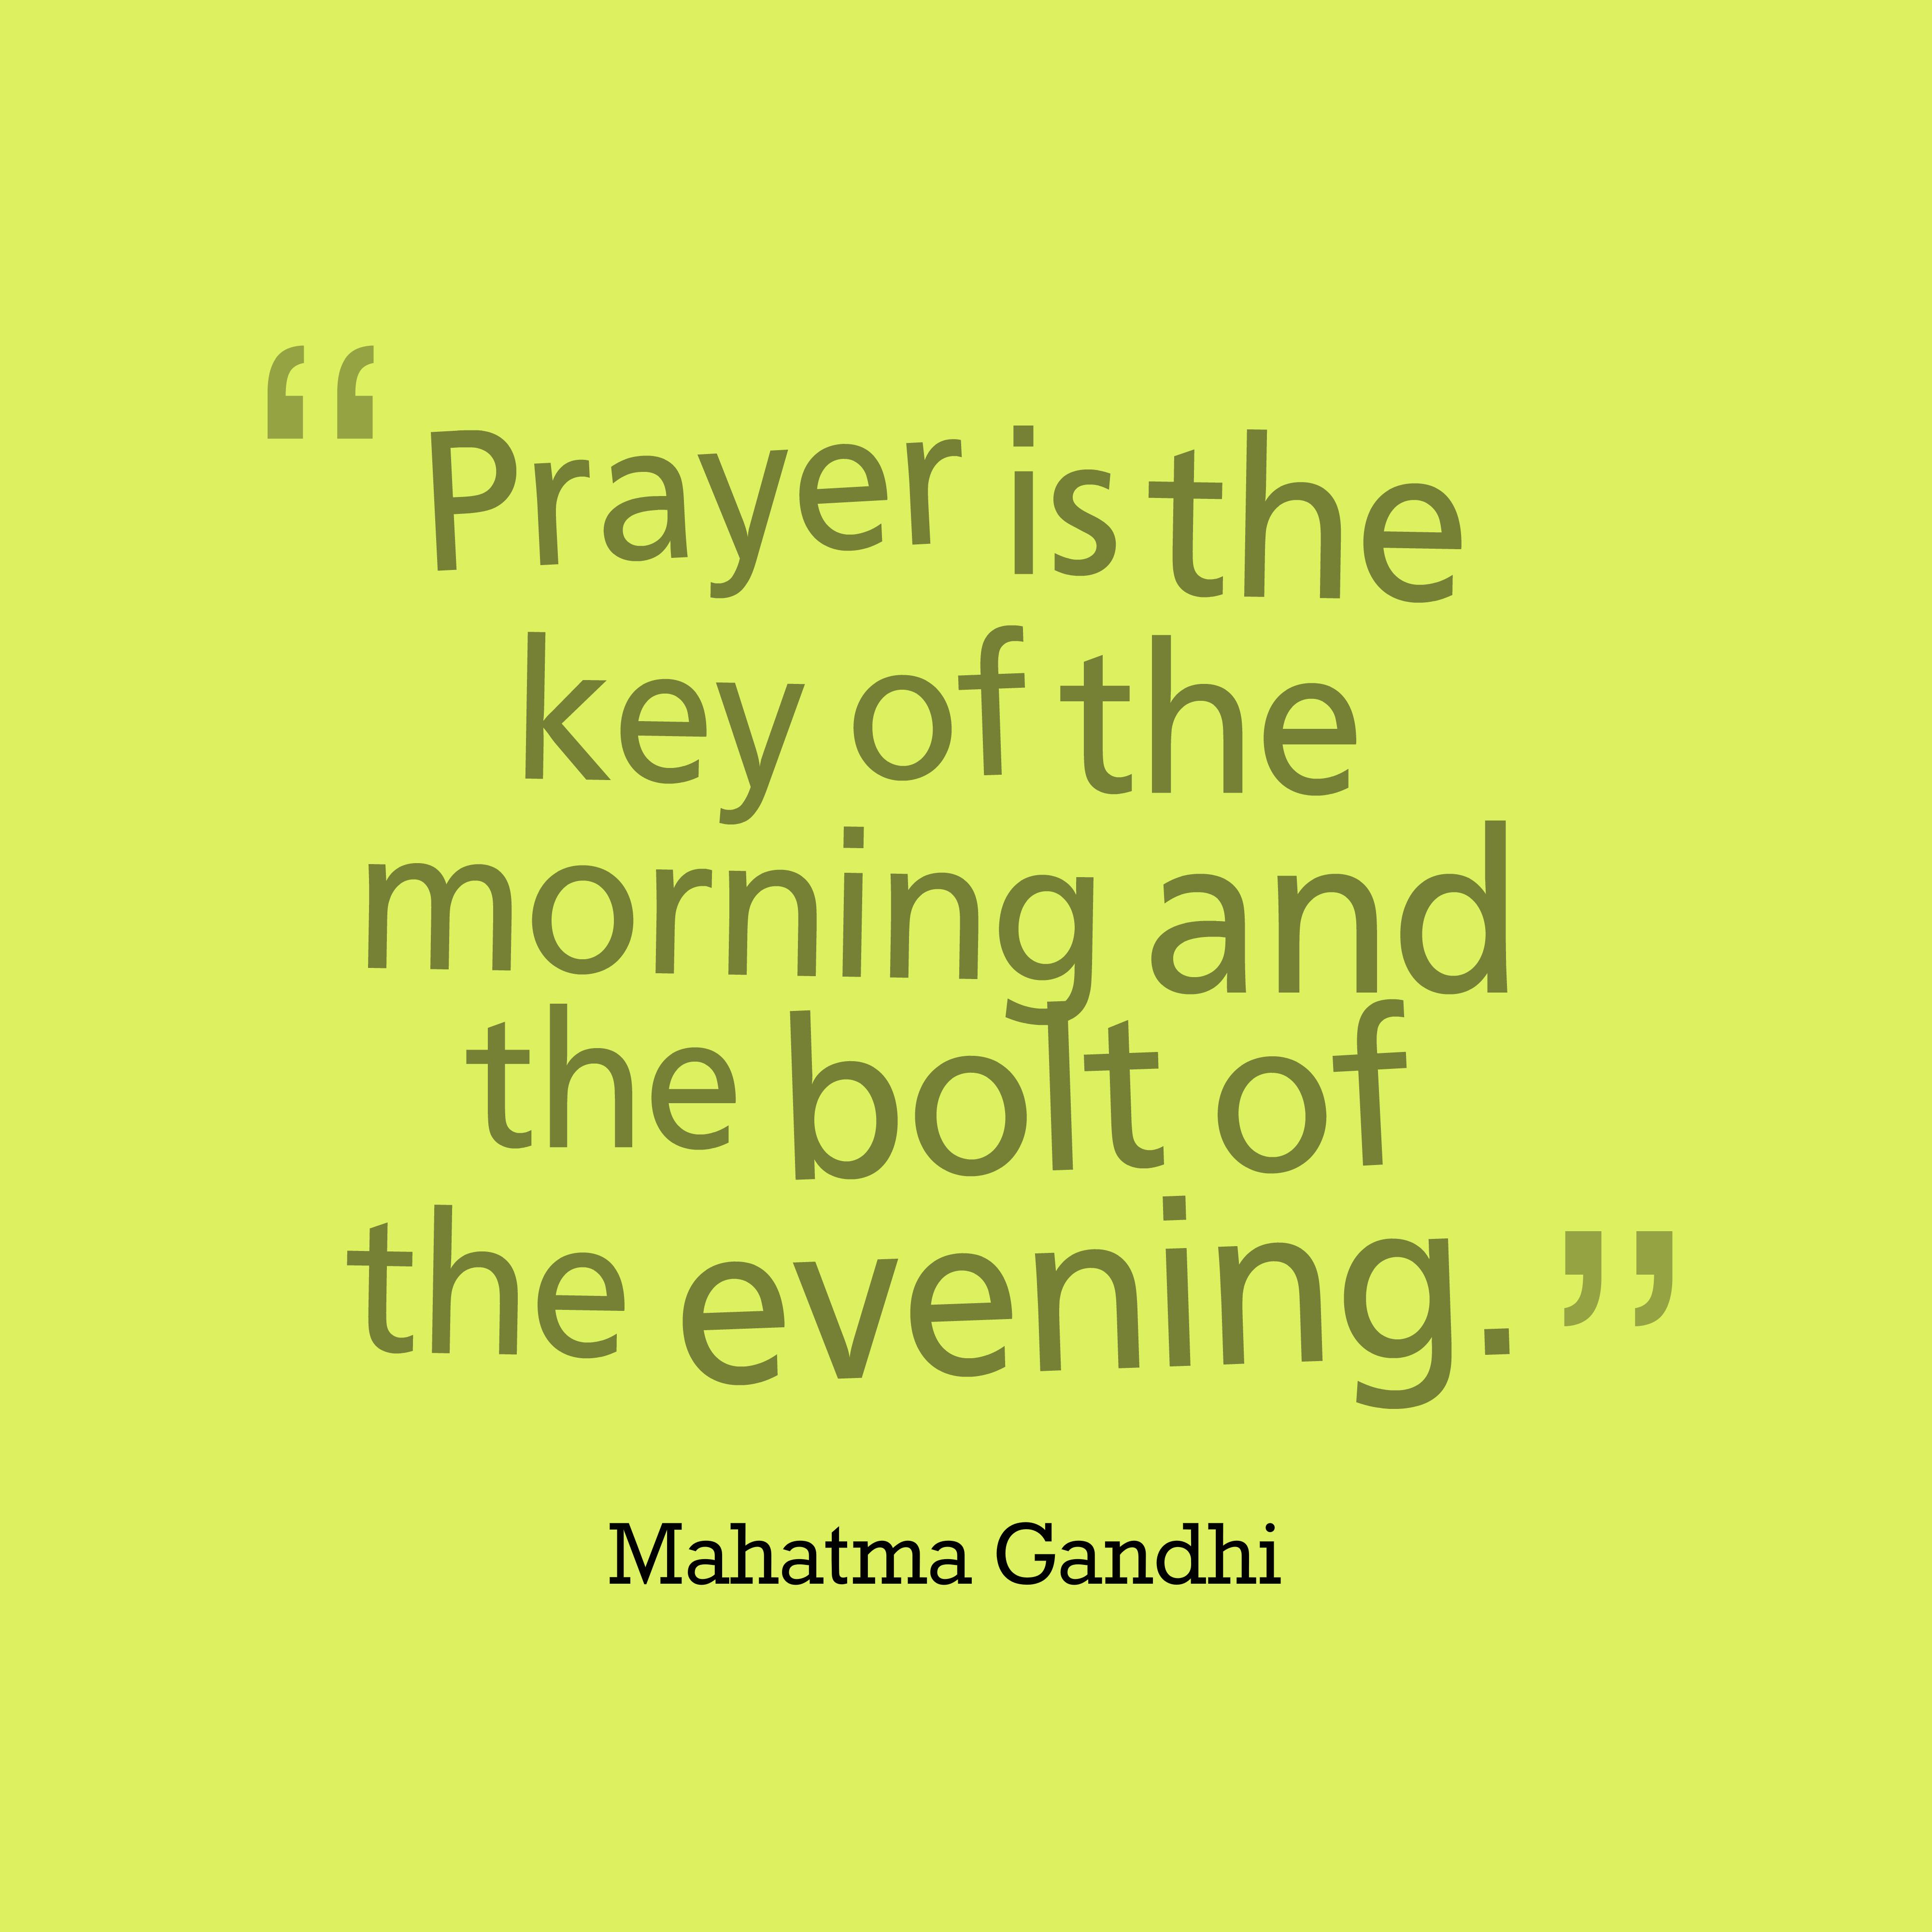 Mahatma Gandhi quote about pray.